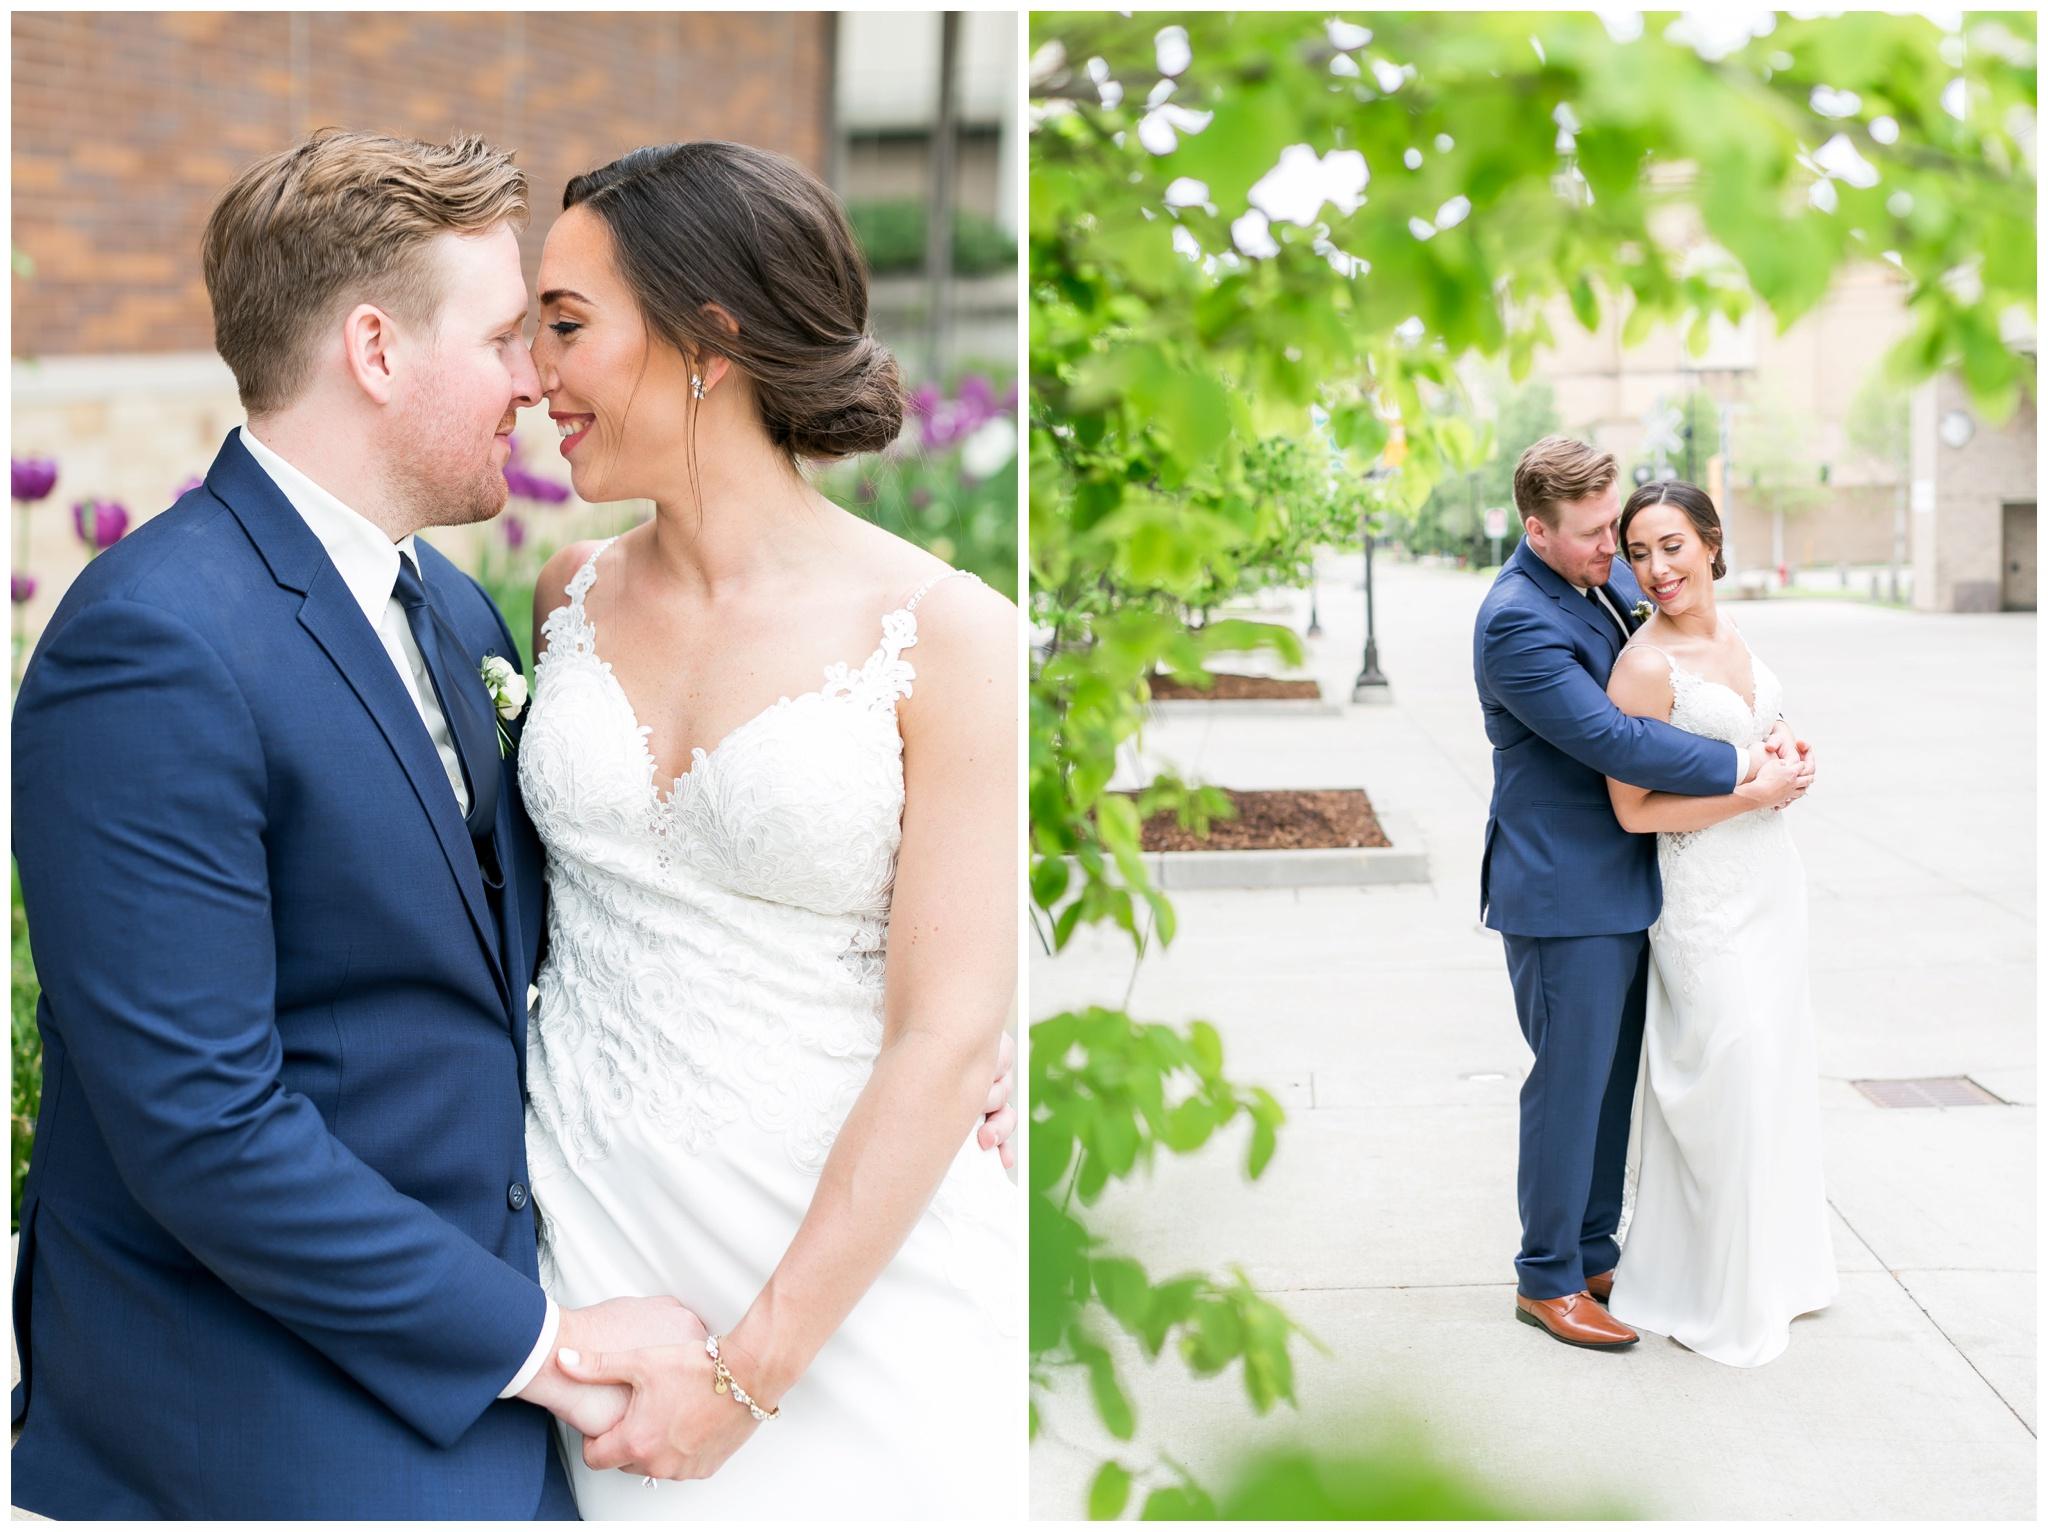 Union_south_Wedding_Madison_Wisconsin_Caynay_Photo_3679.jpg